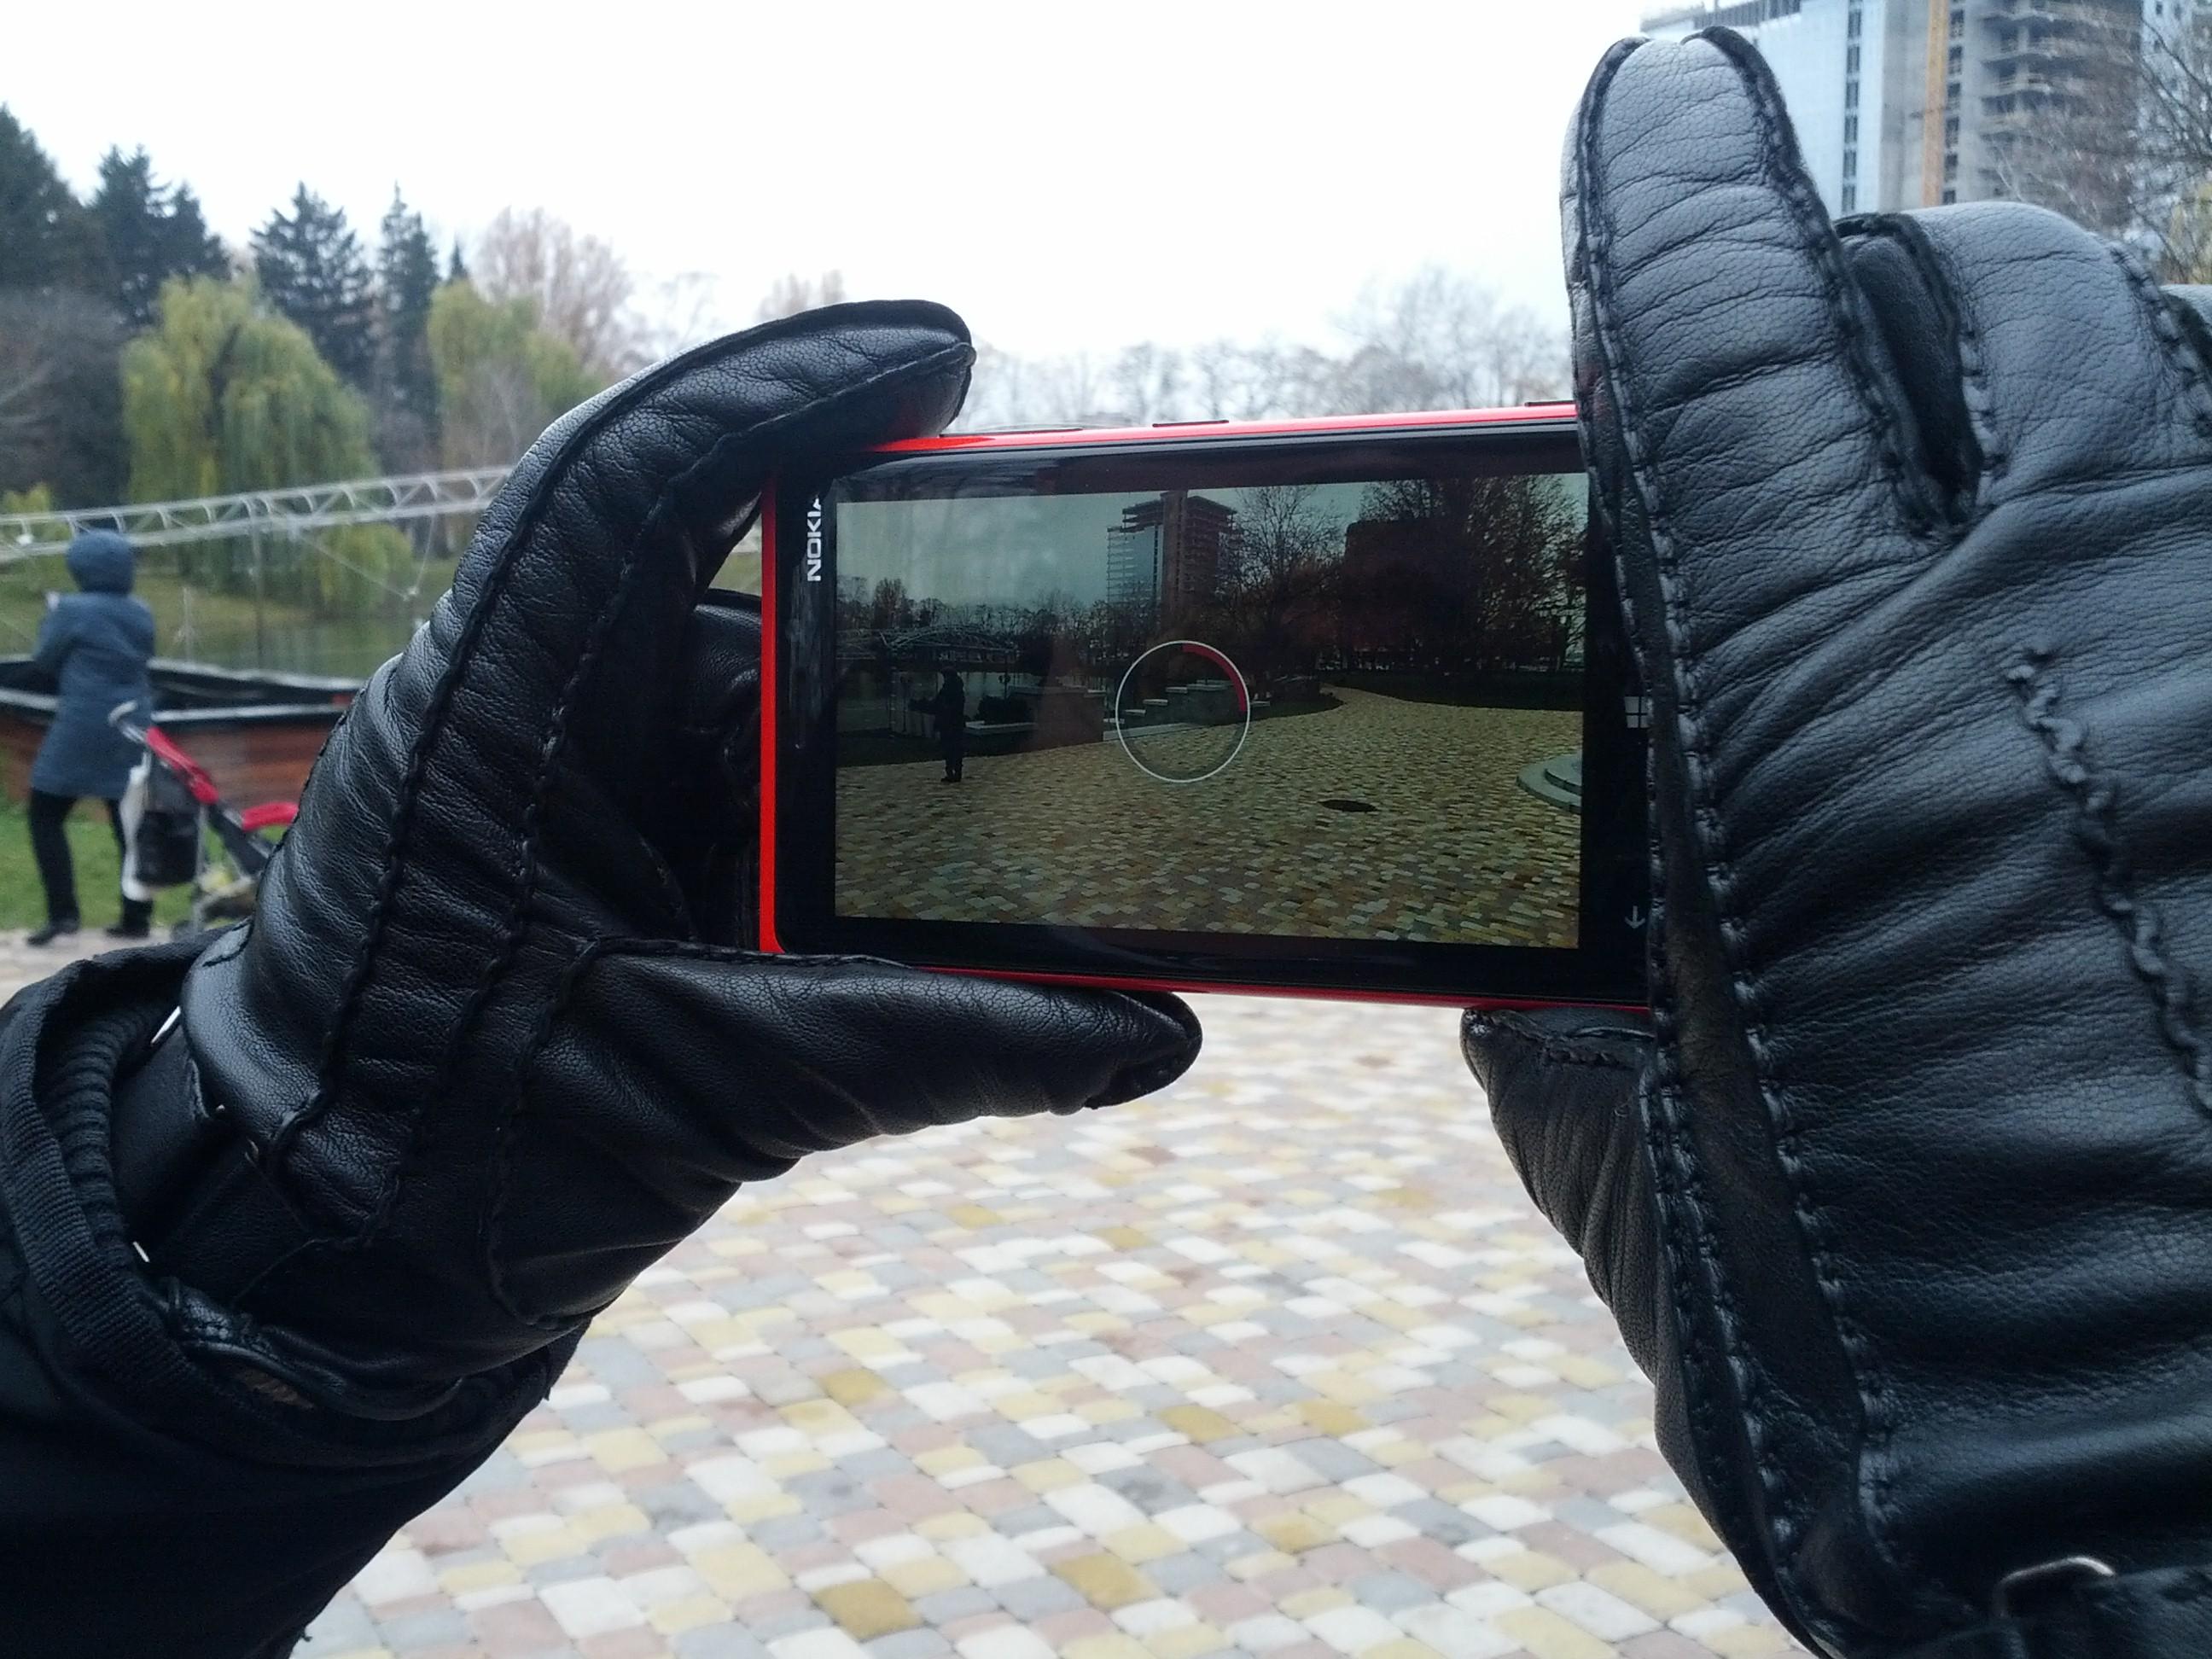 Nokia Lumia 920 тестирование возможностей аппарата